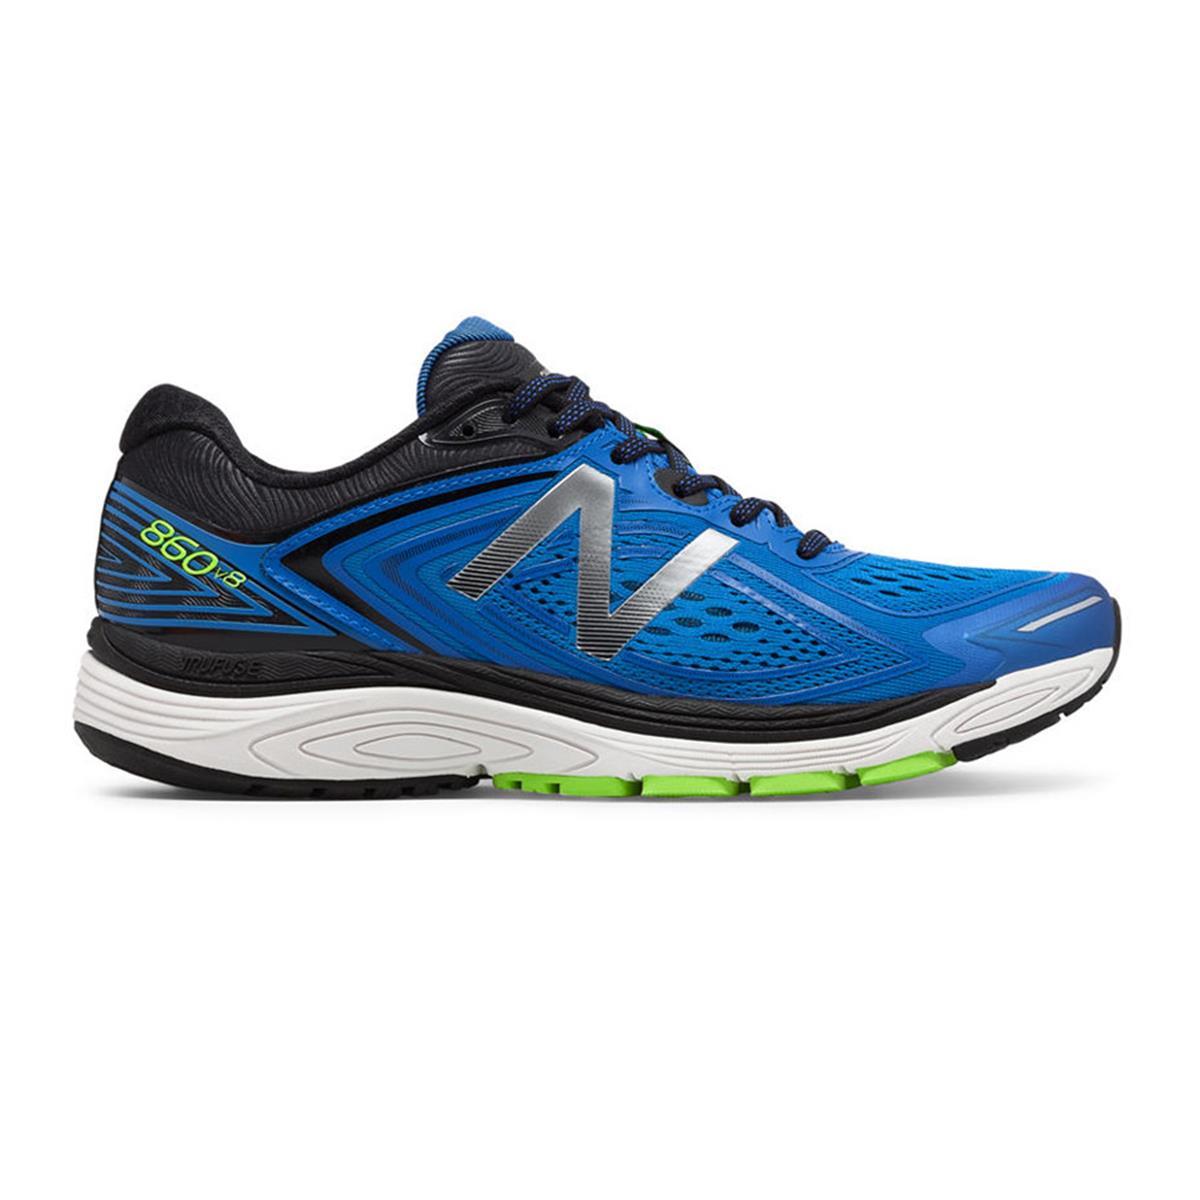 New Balance Vibram Running Shoes